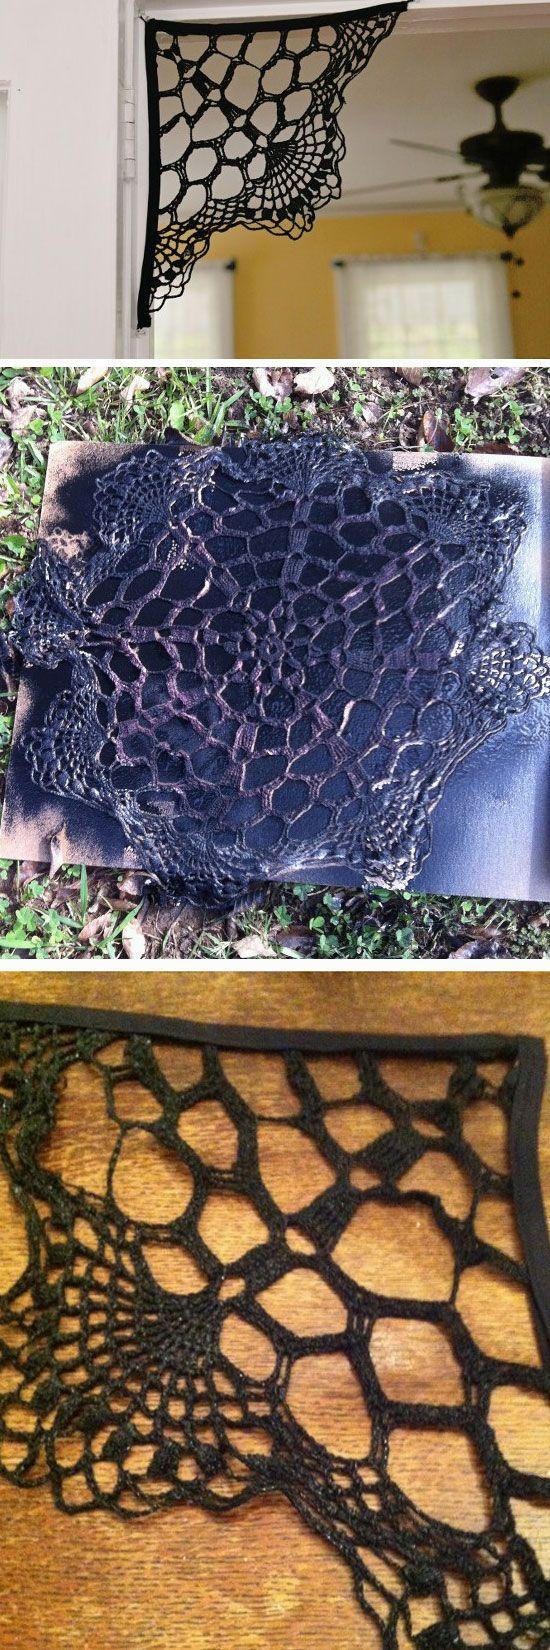 Diy halloween wedding decorations  Doily Spiderweb  Click Pic for  Easy DIY outdoor Halloween